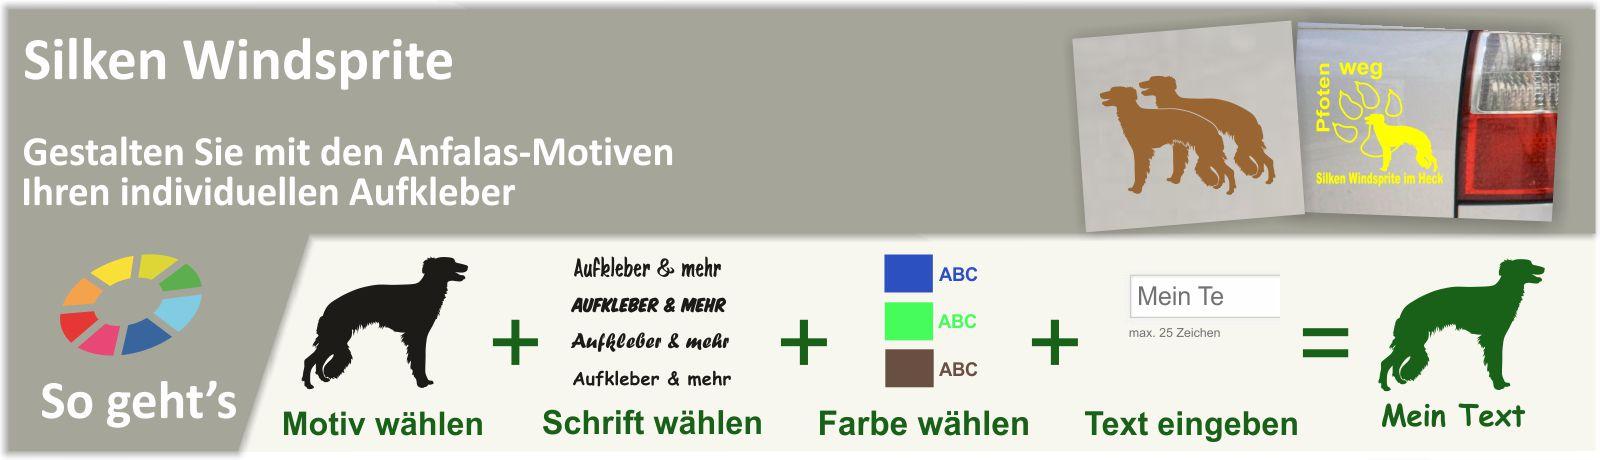 Silken Windsprite Wandtattoos